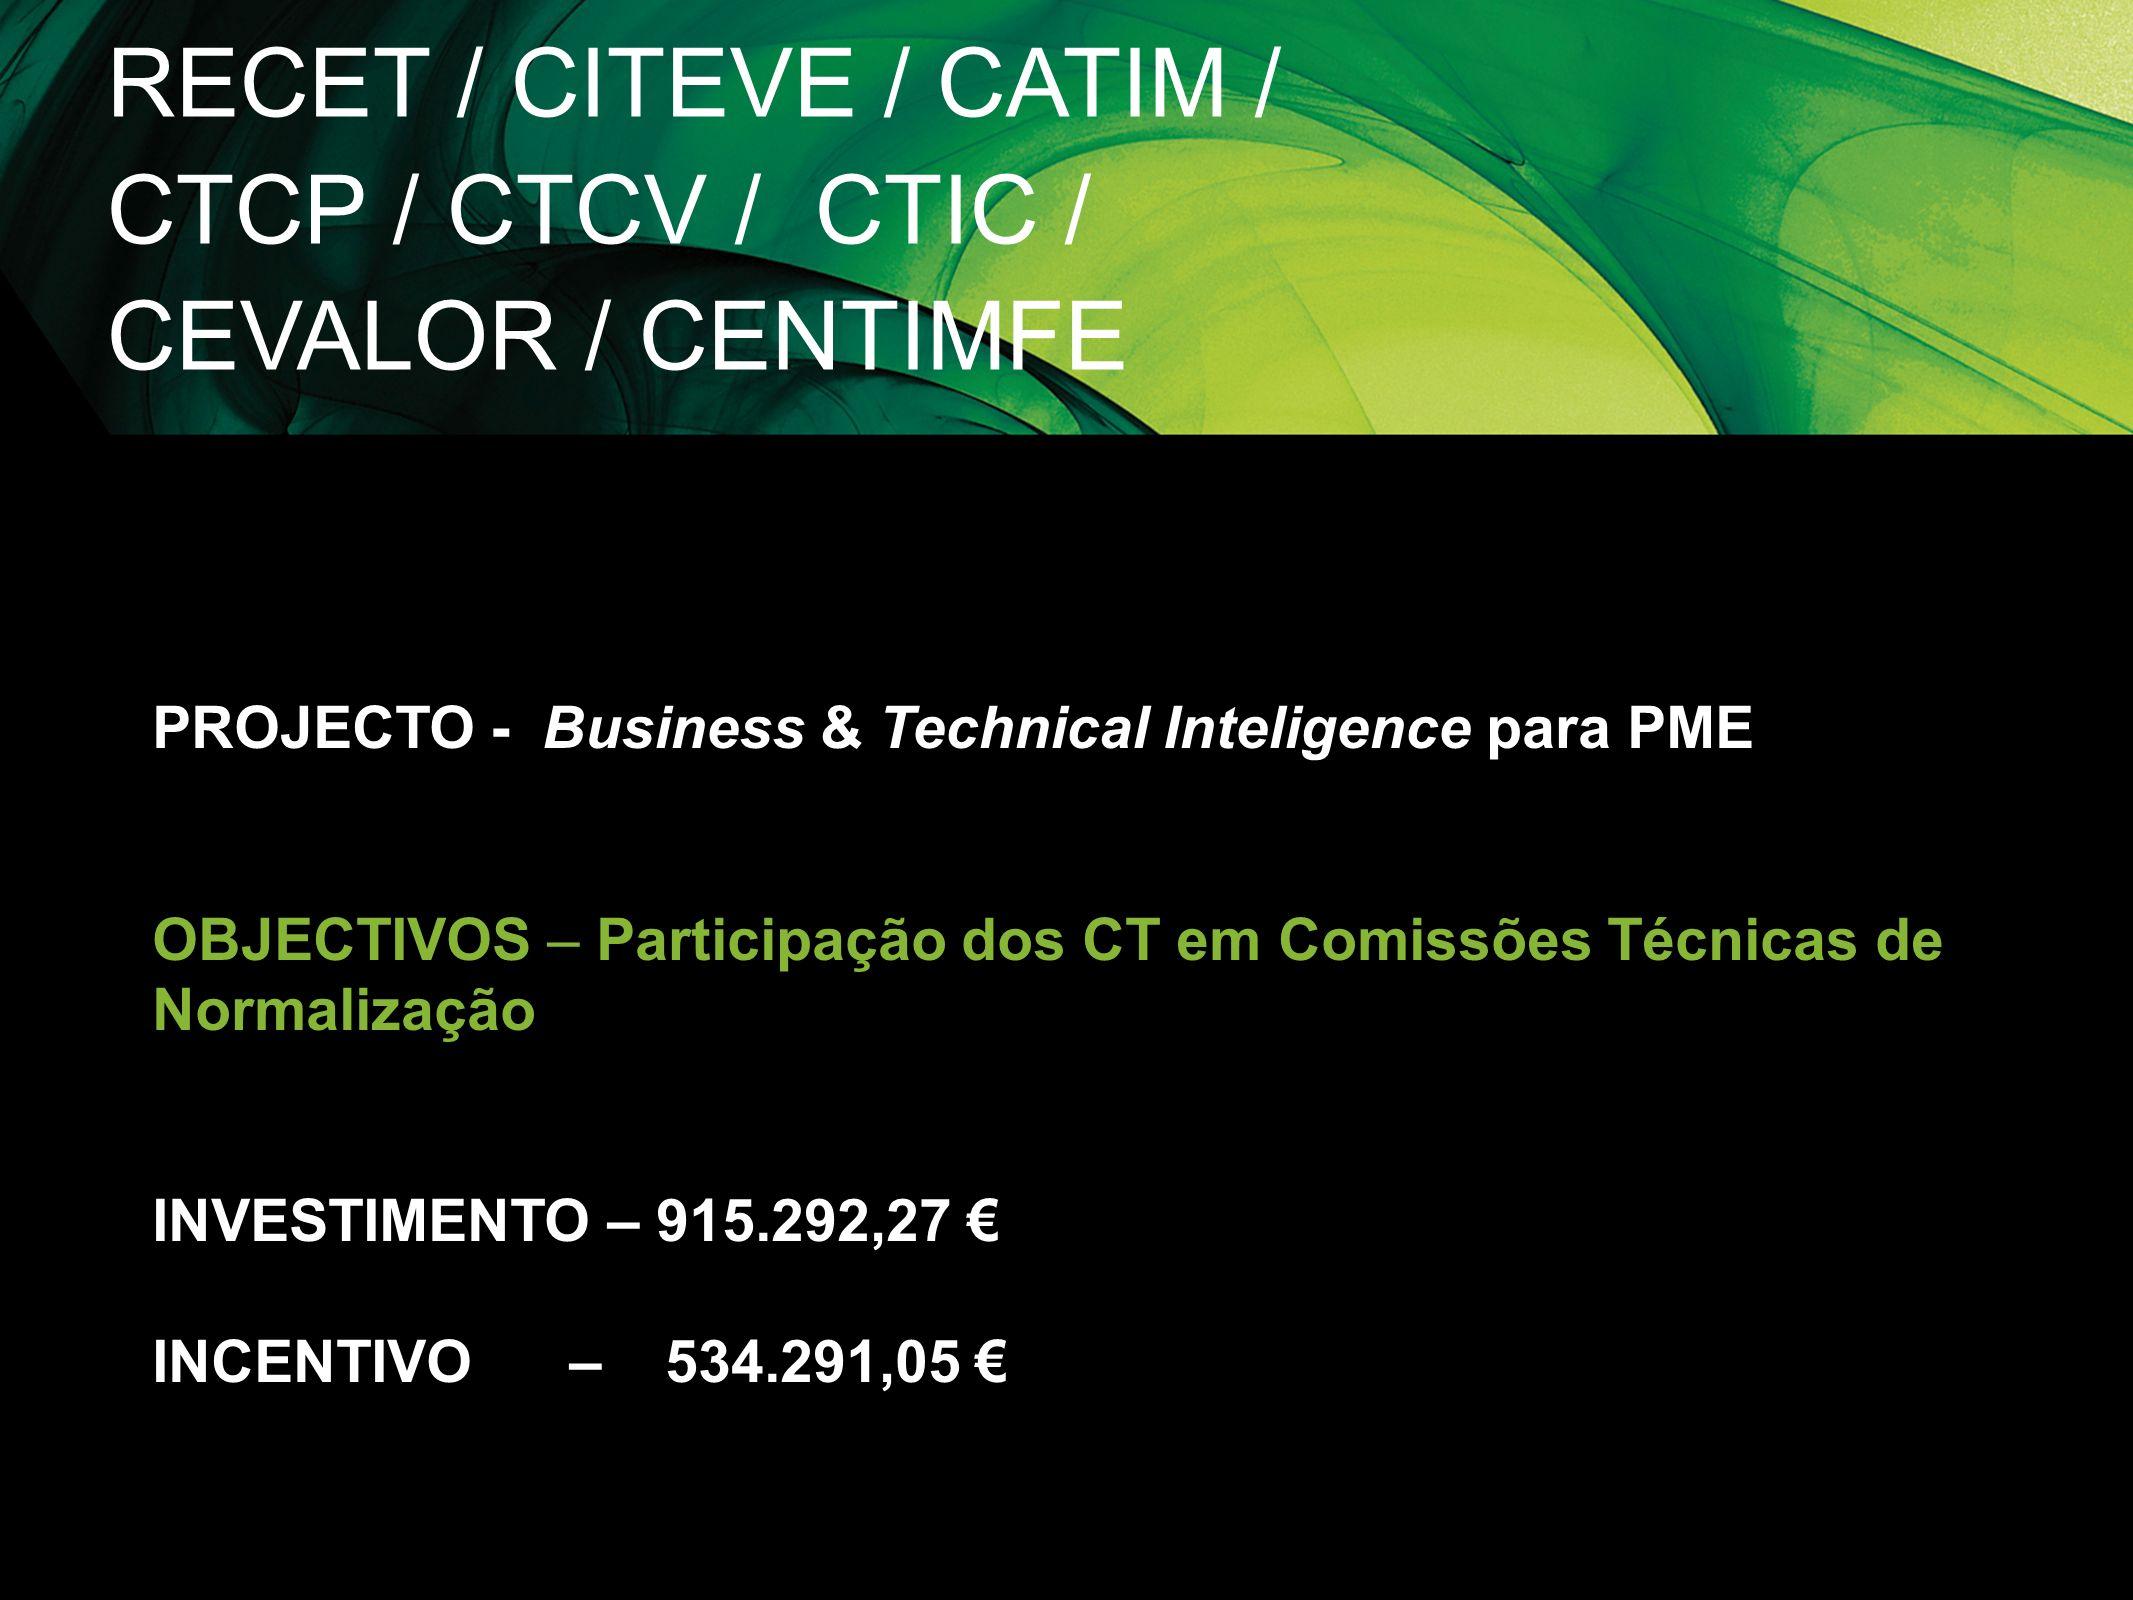 RECET / CITEVE / CATIM / CTCP / CTCV / CTIC / CEVALOR / CENTIMFE PROJECTO - Business & Technical Inteligence para PME OBJECTIVOS – Participação dos CT